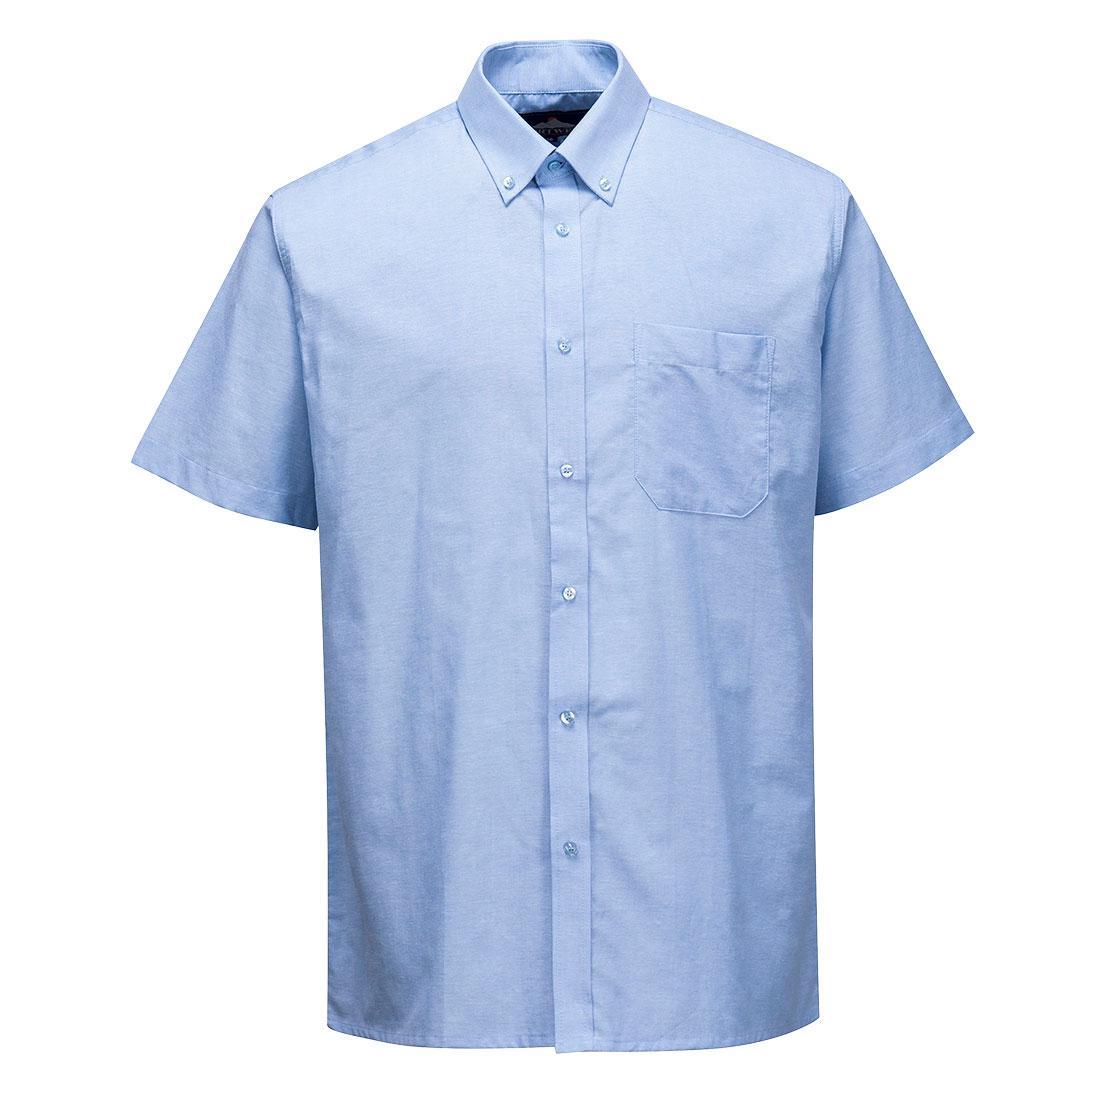 Oxford Shirt Short Sleeve Blue 200